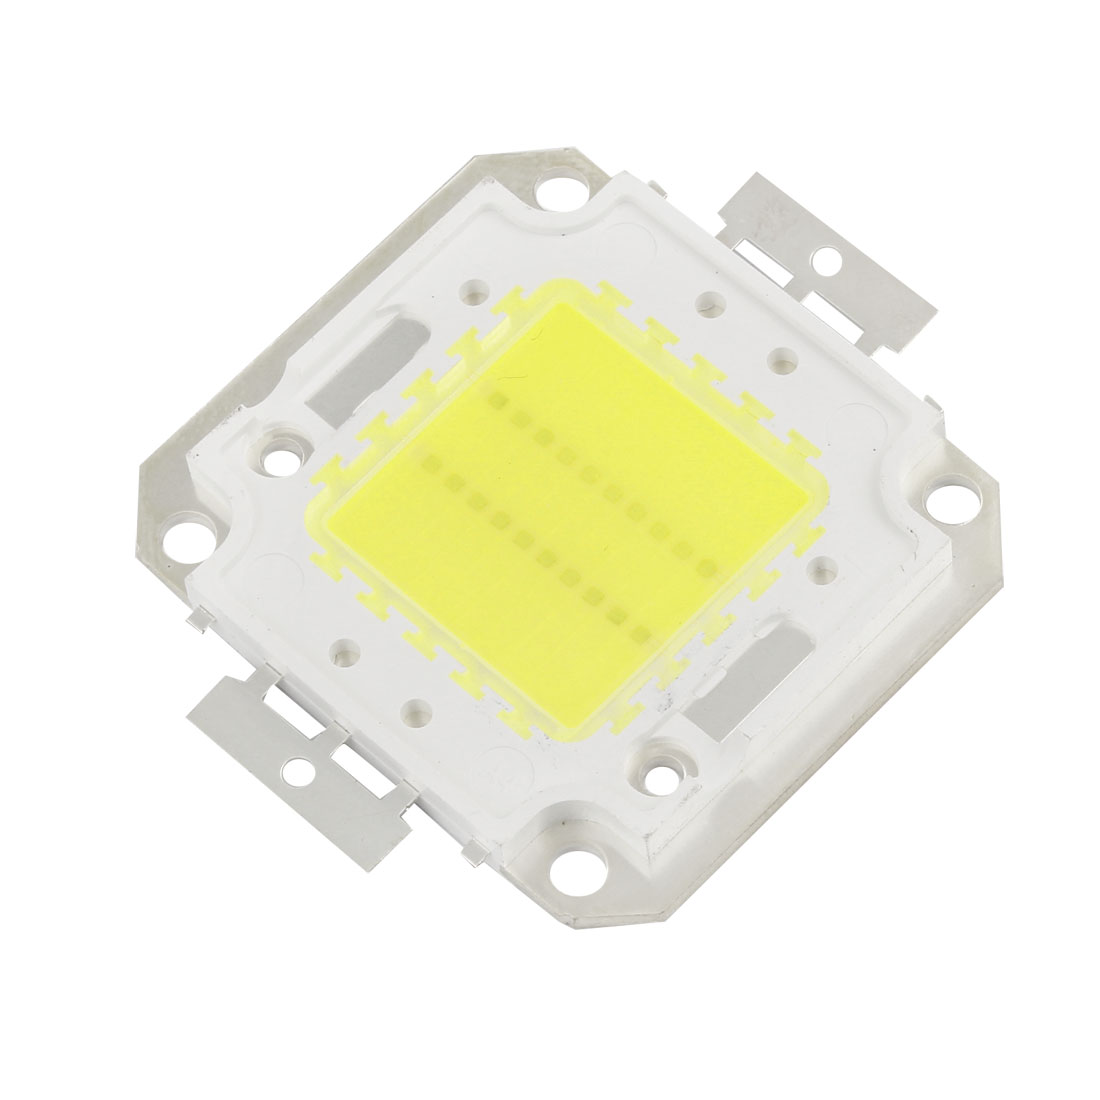 32-34V 700mA 20W Pure White Light High Power SMD LED Chip Lamp Bulb